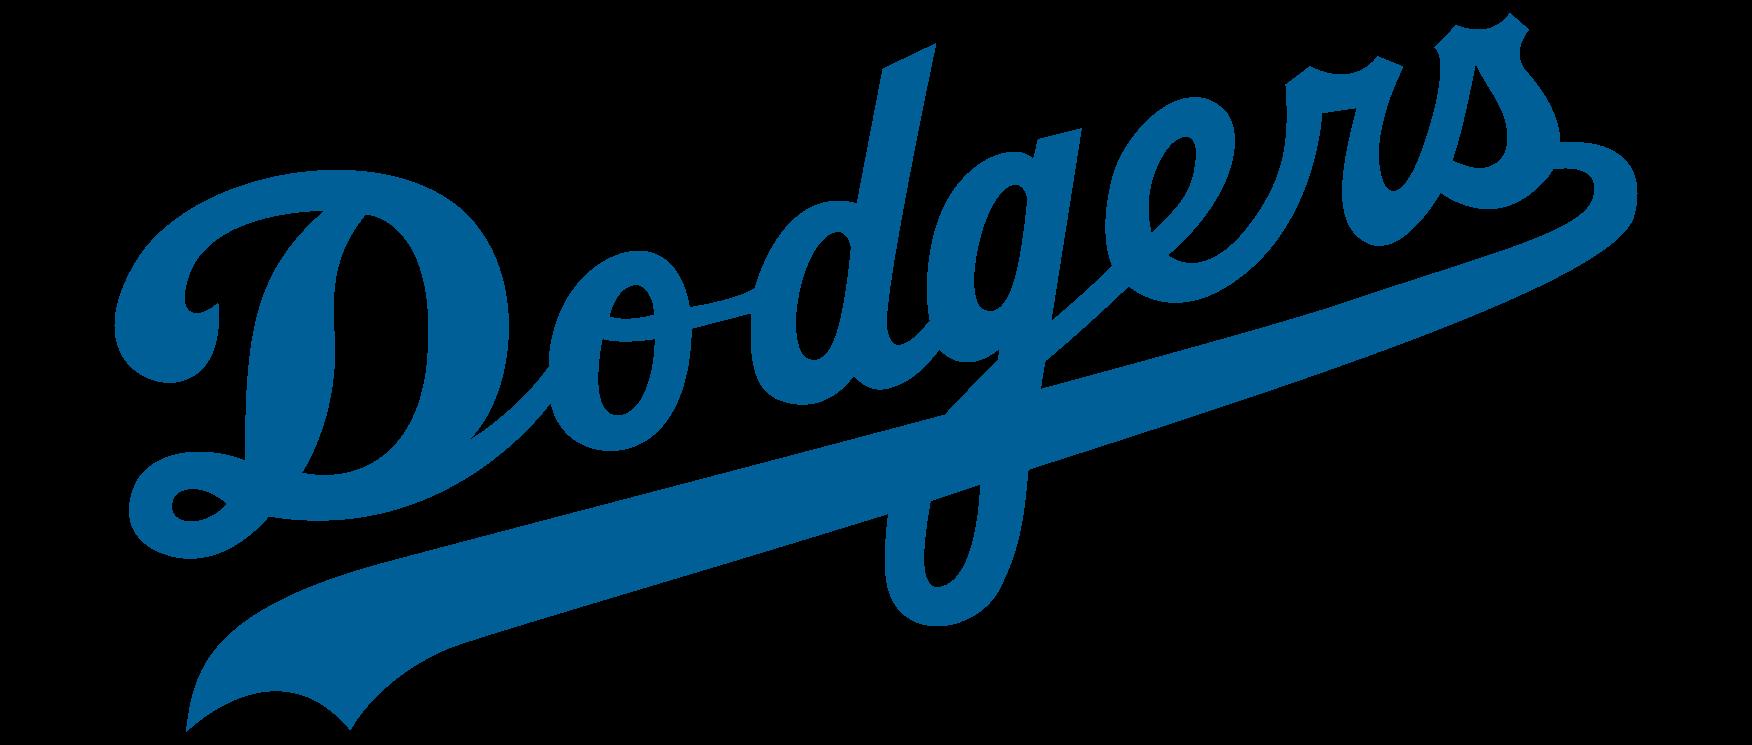 dodgers-logo.png